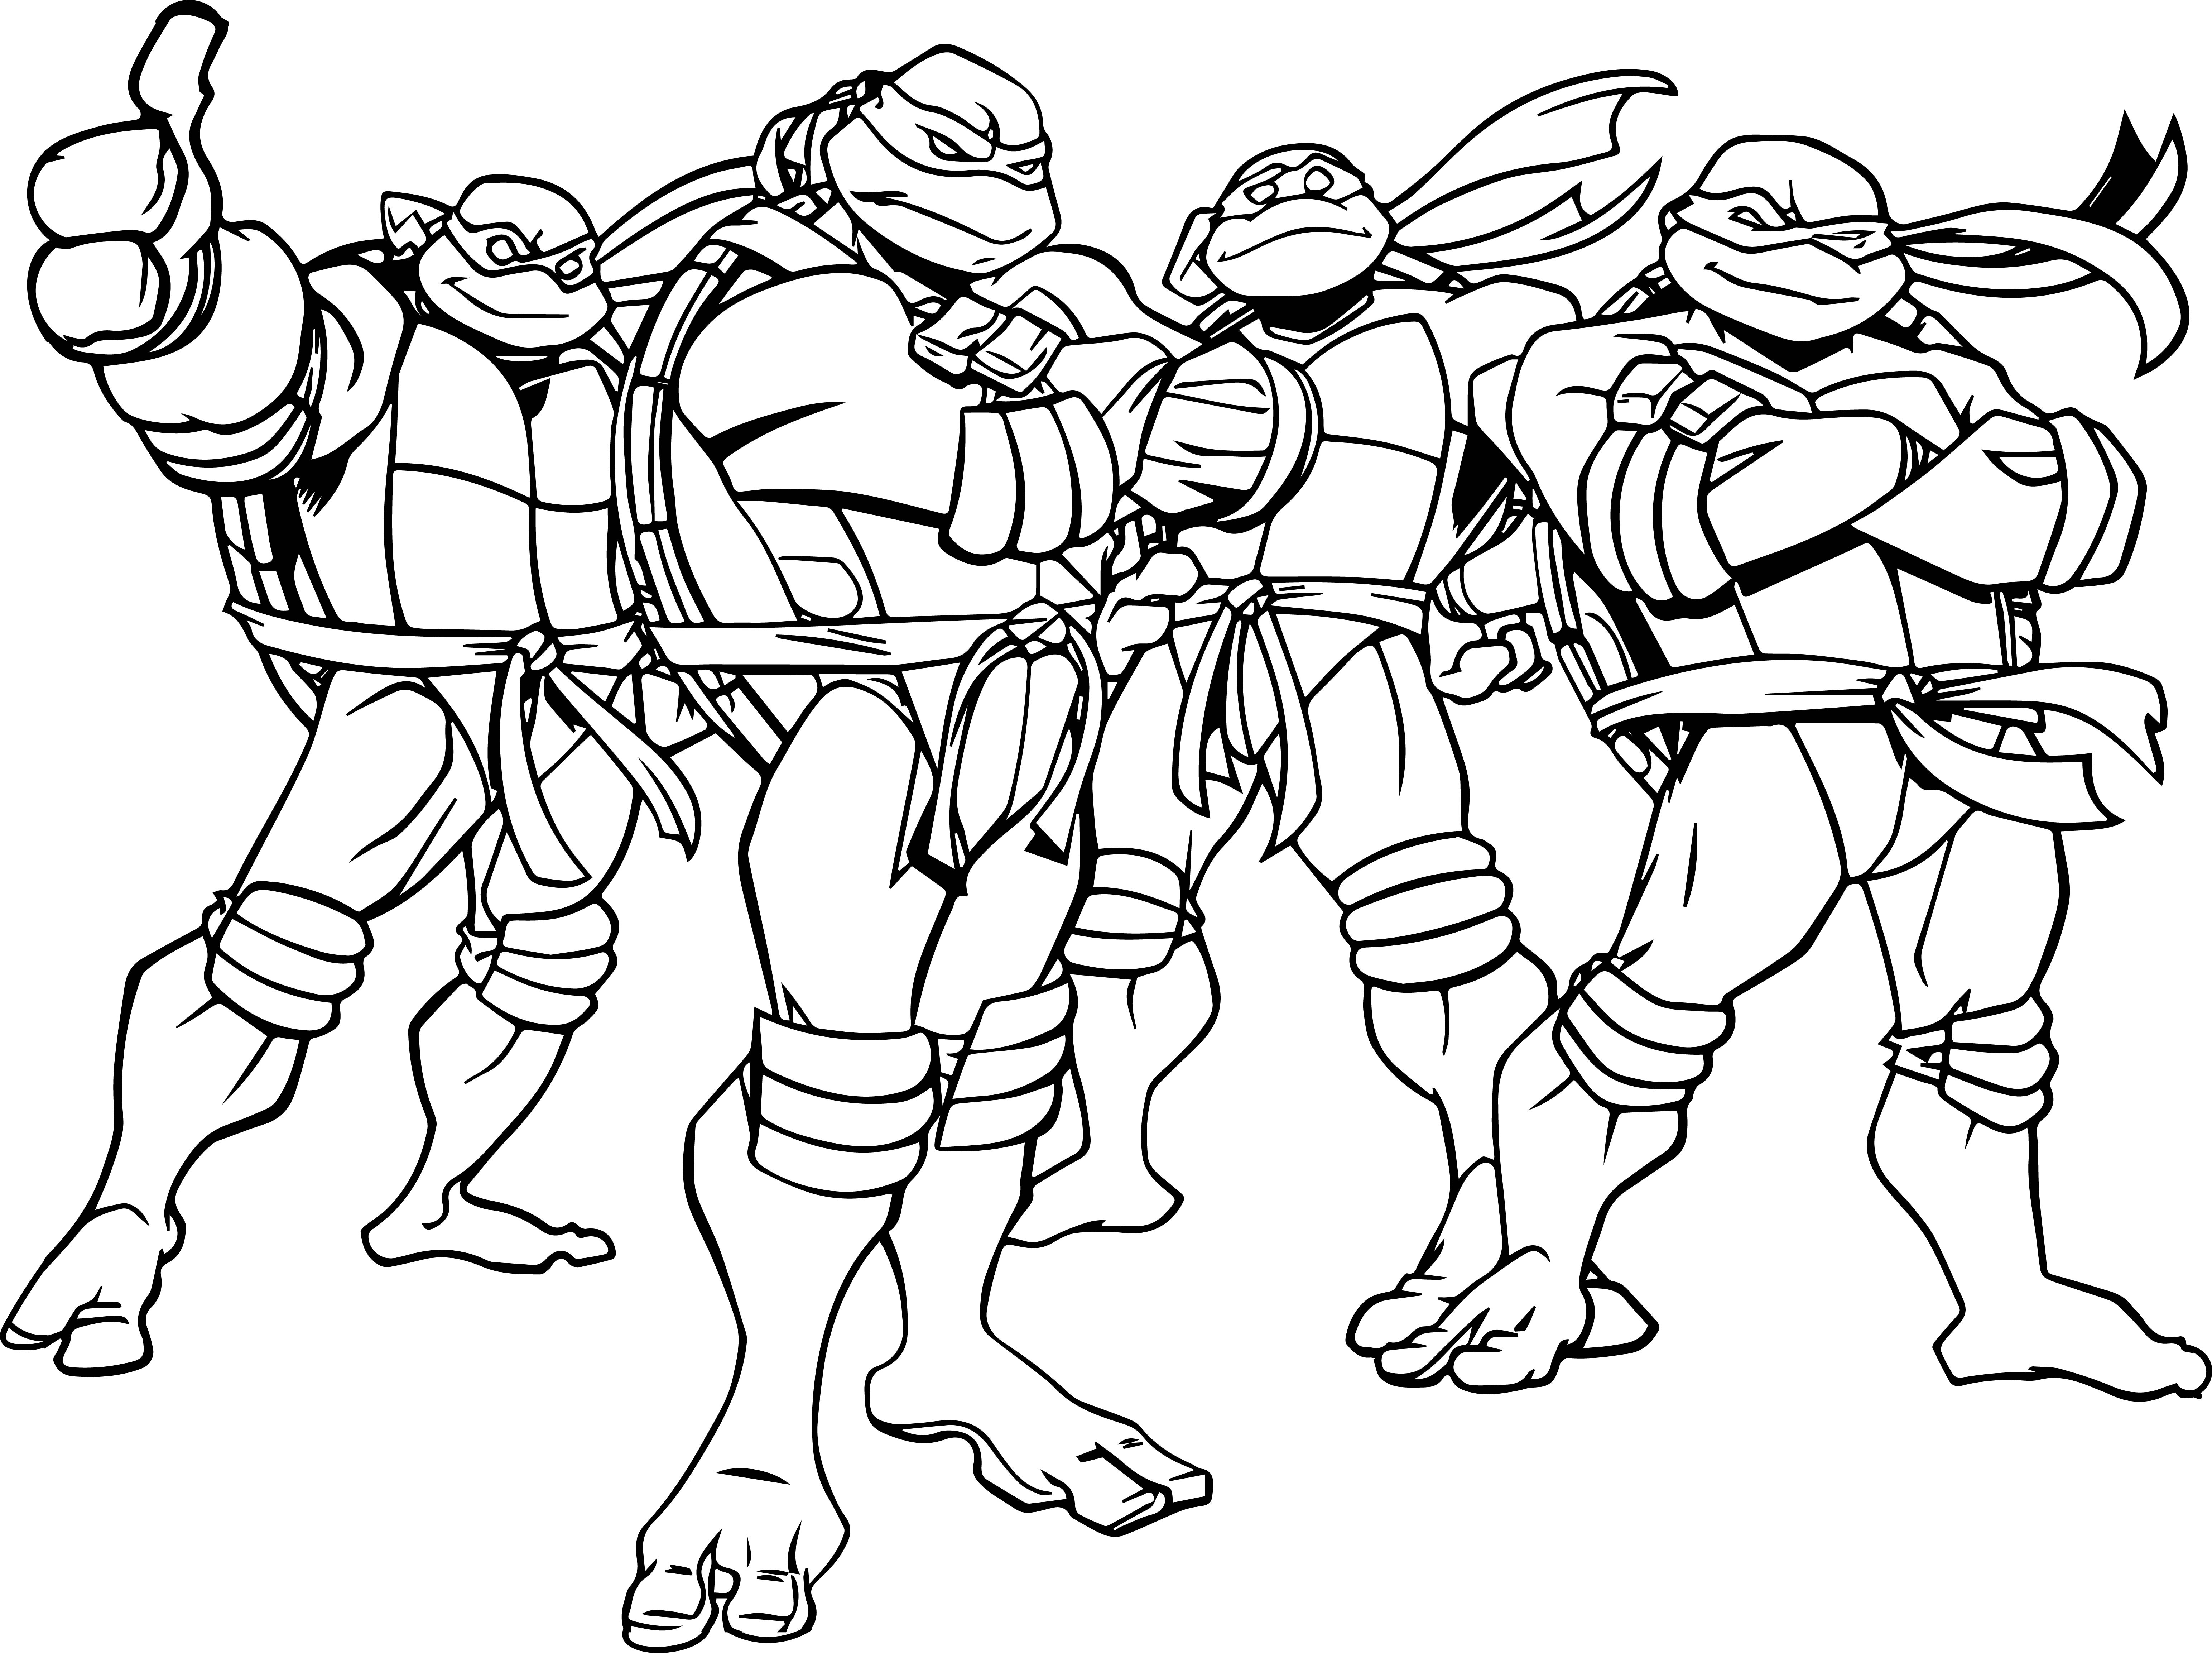 6176x4614 Teenage Mutant Ninja Turtle Coloring Pages Printable To Good Draw